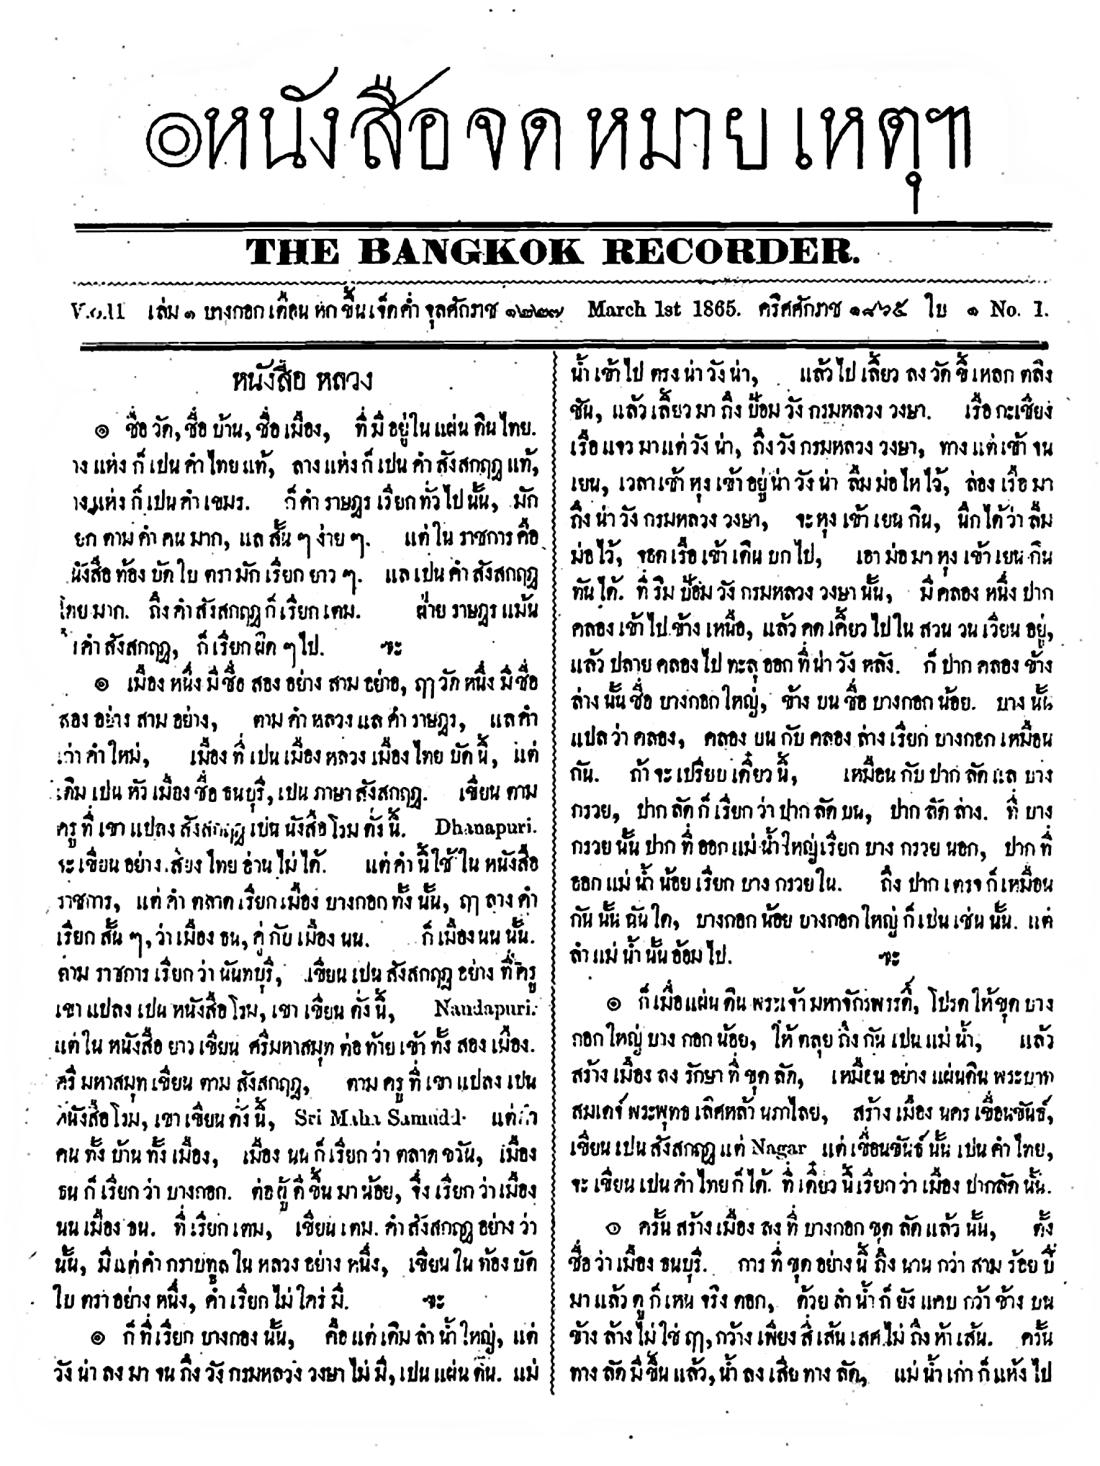 Bangkok_Recorder.jpg